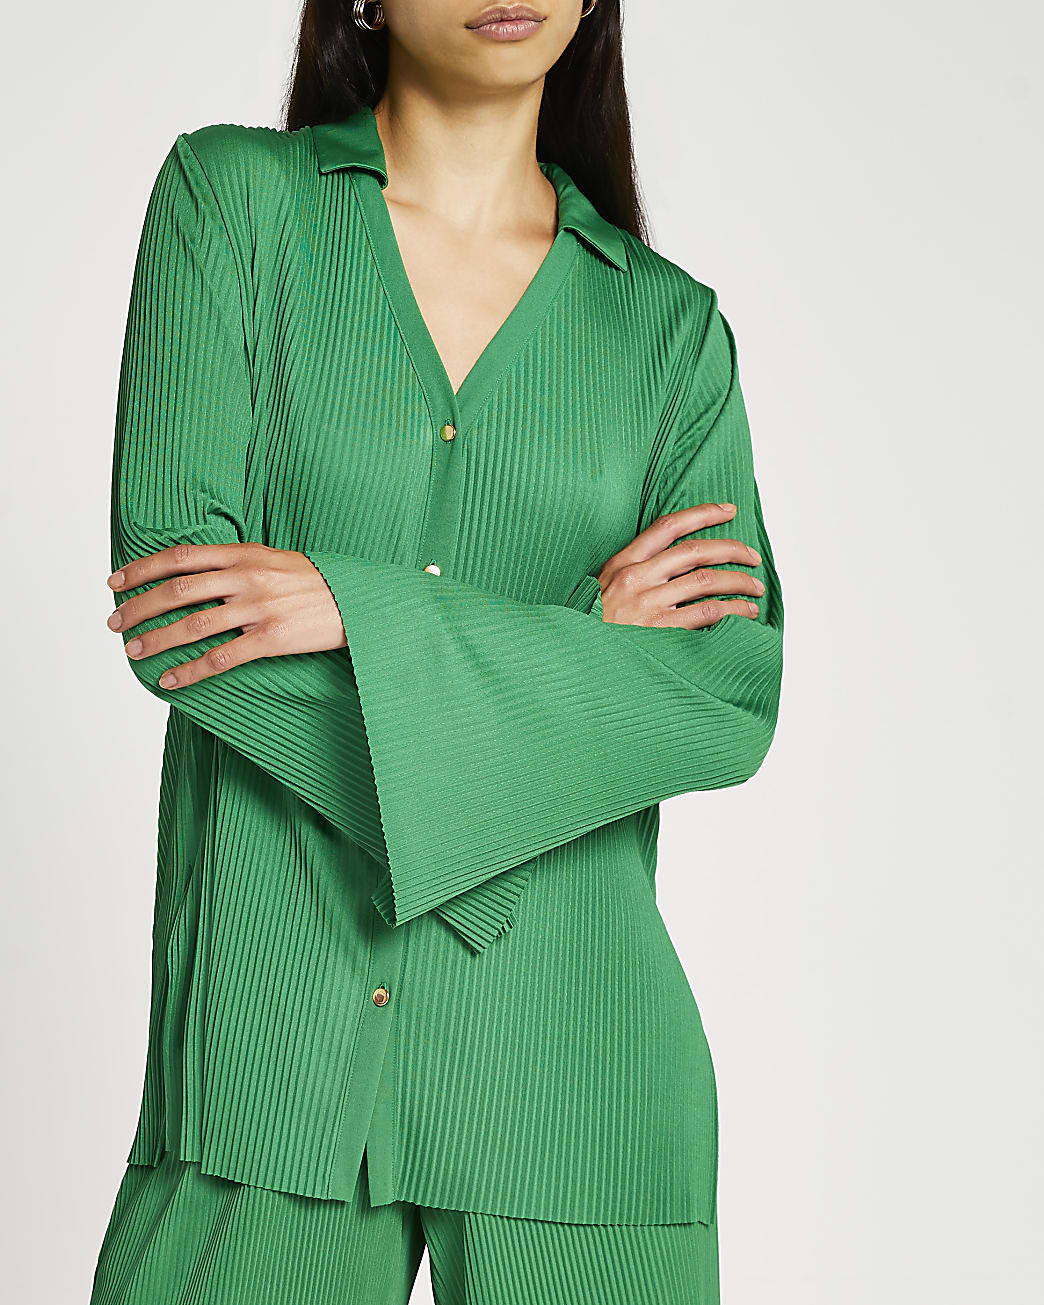 Green pleated shirt